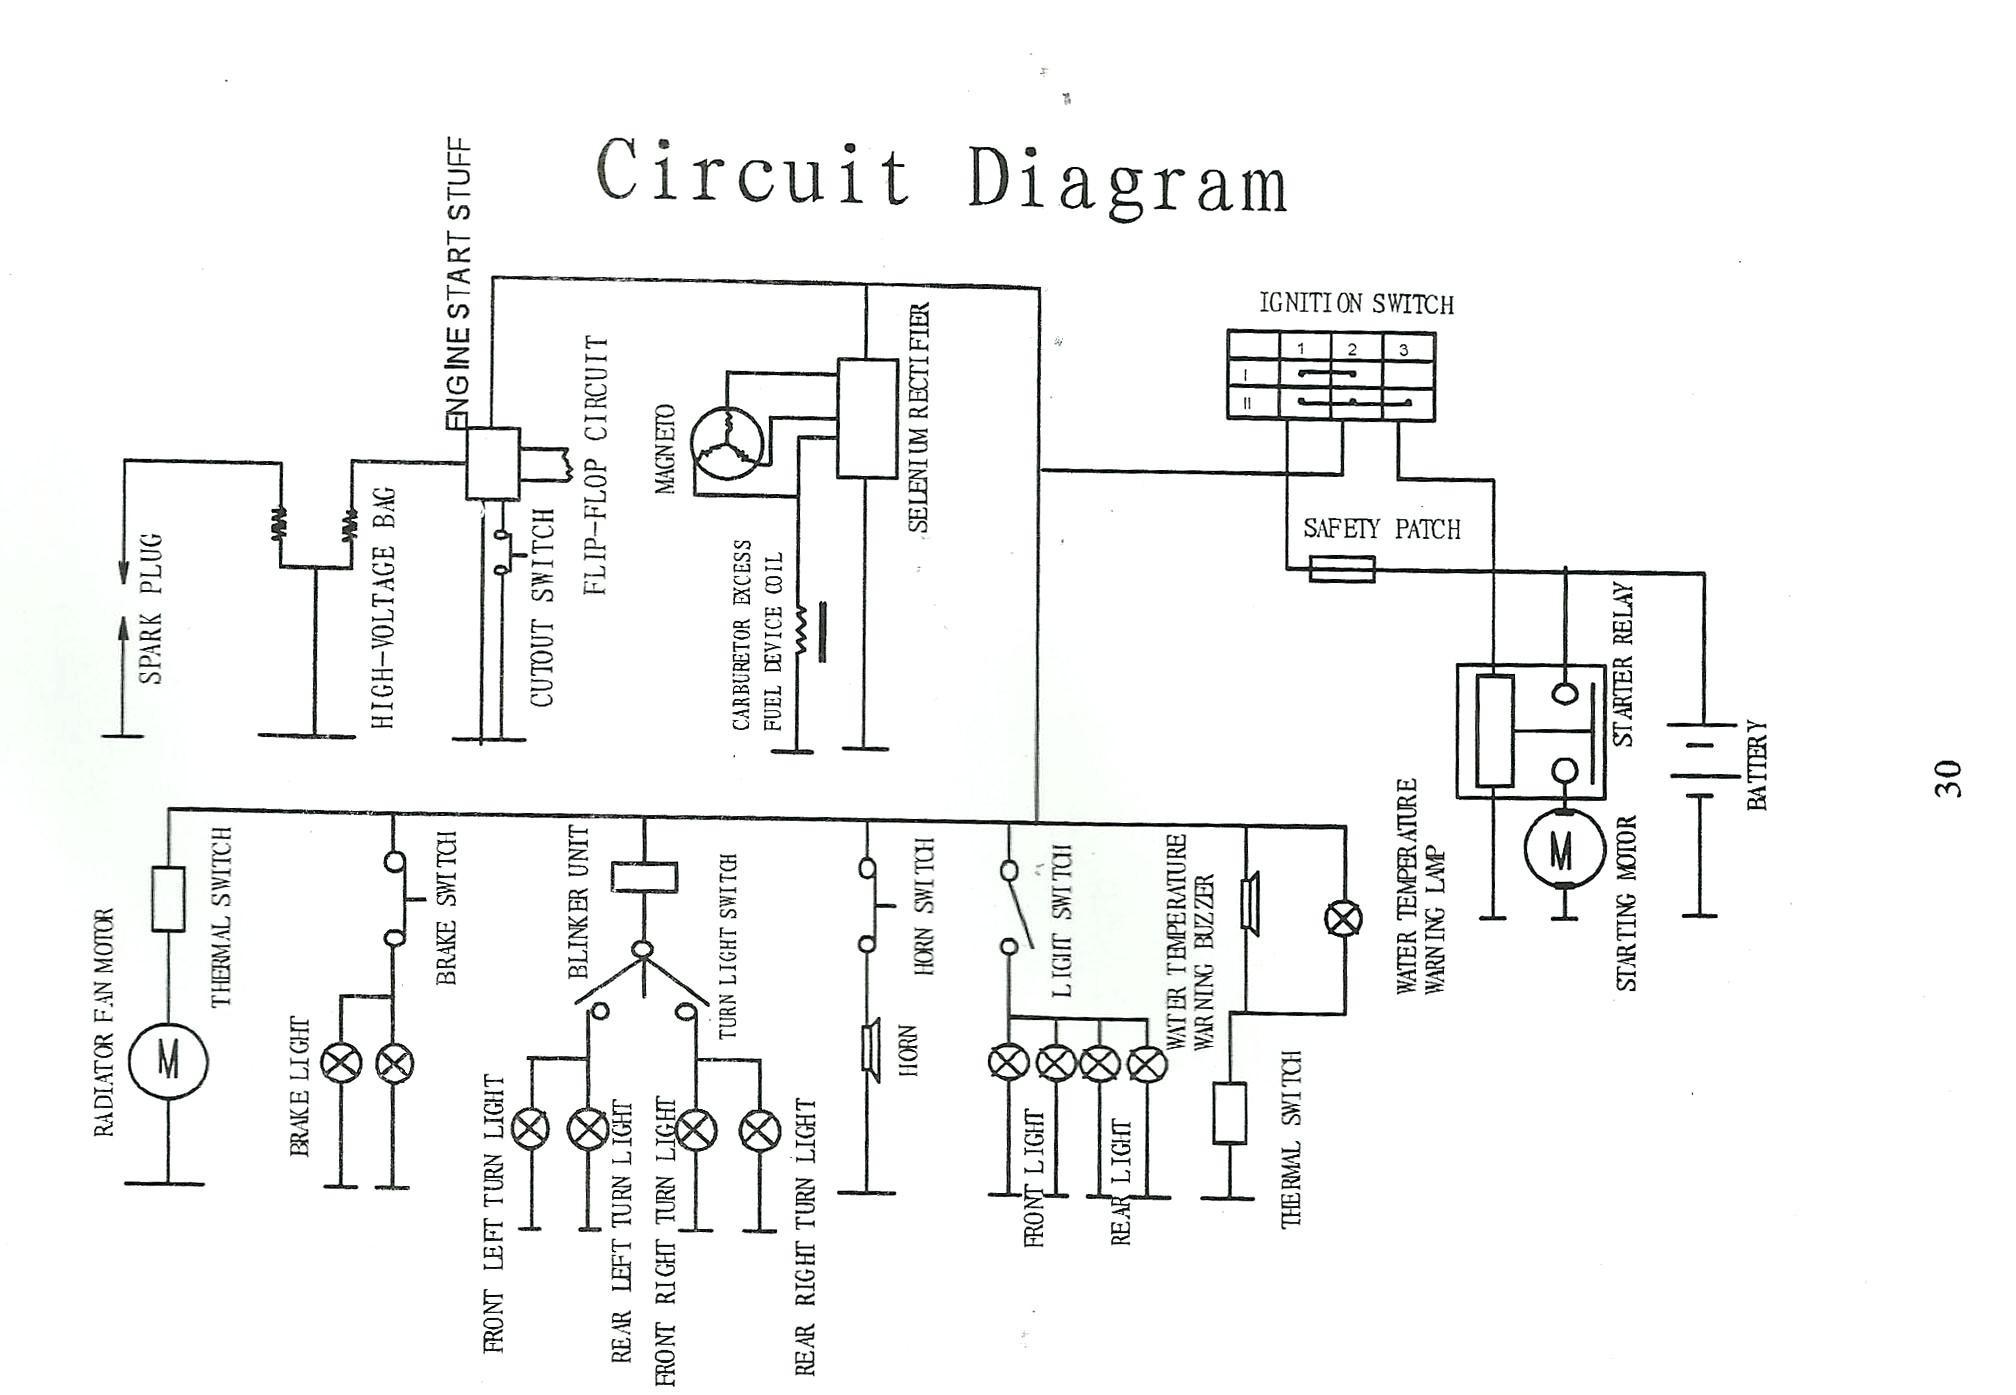 49cc mini chopper wiring diagram basic